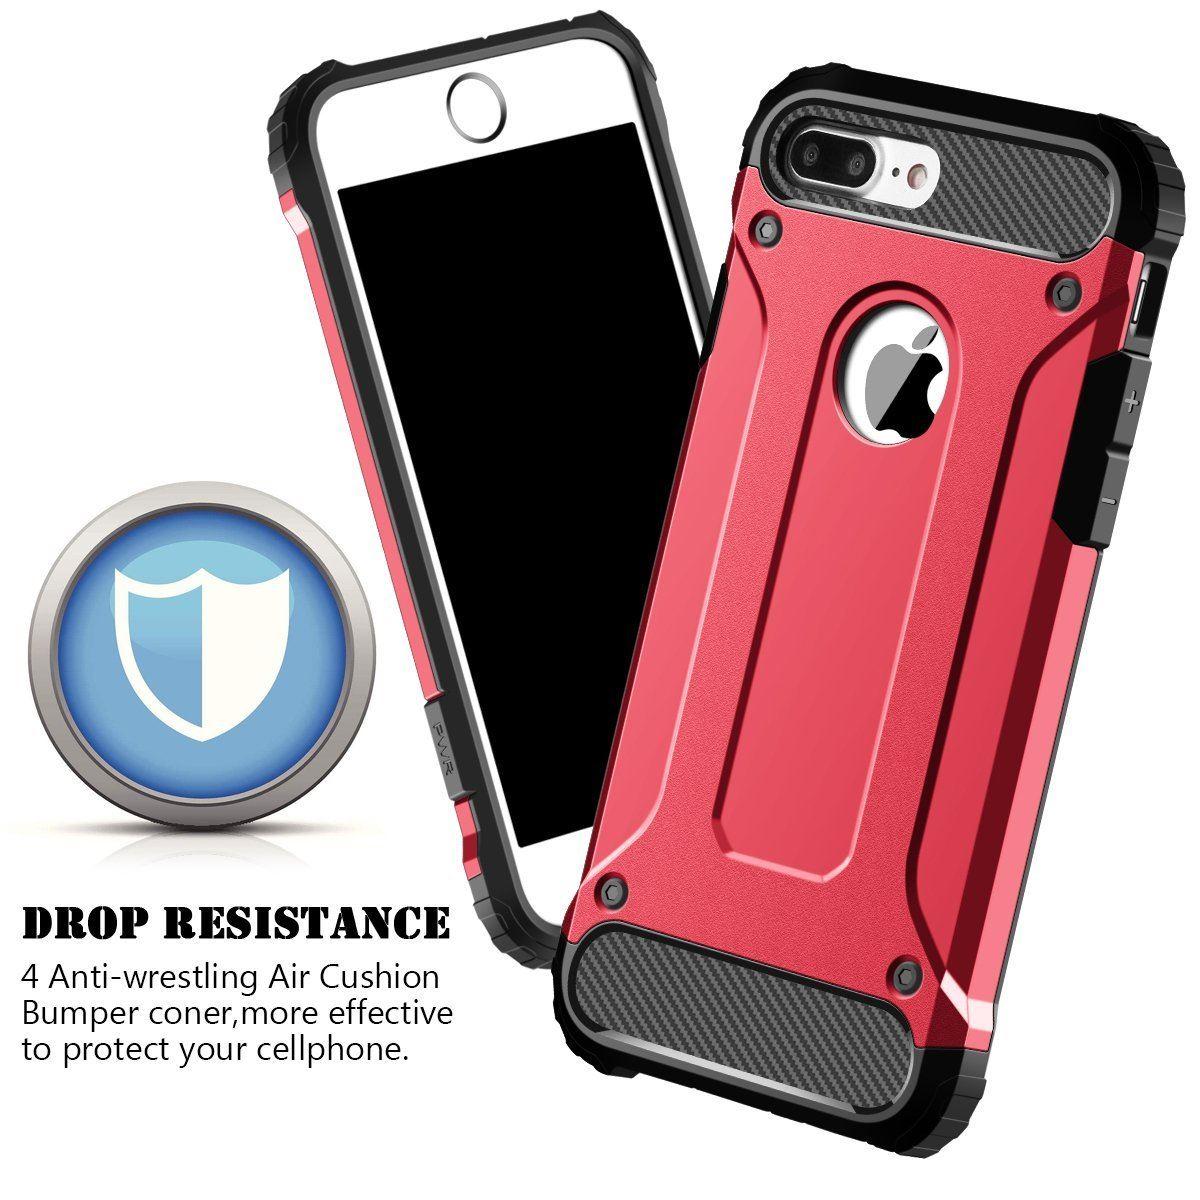 thumbnail 80 - For Apple iPhone 11 Pro Max XR Xs X 8 7 Plus 6 5 Se Case Cover Tough Armor